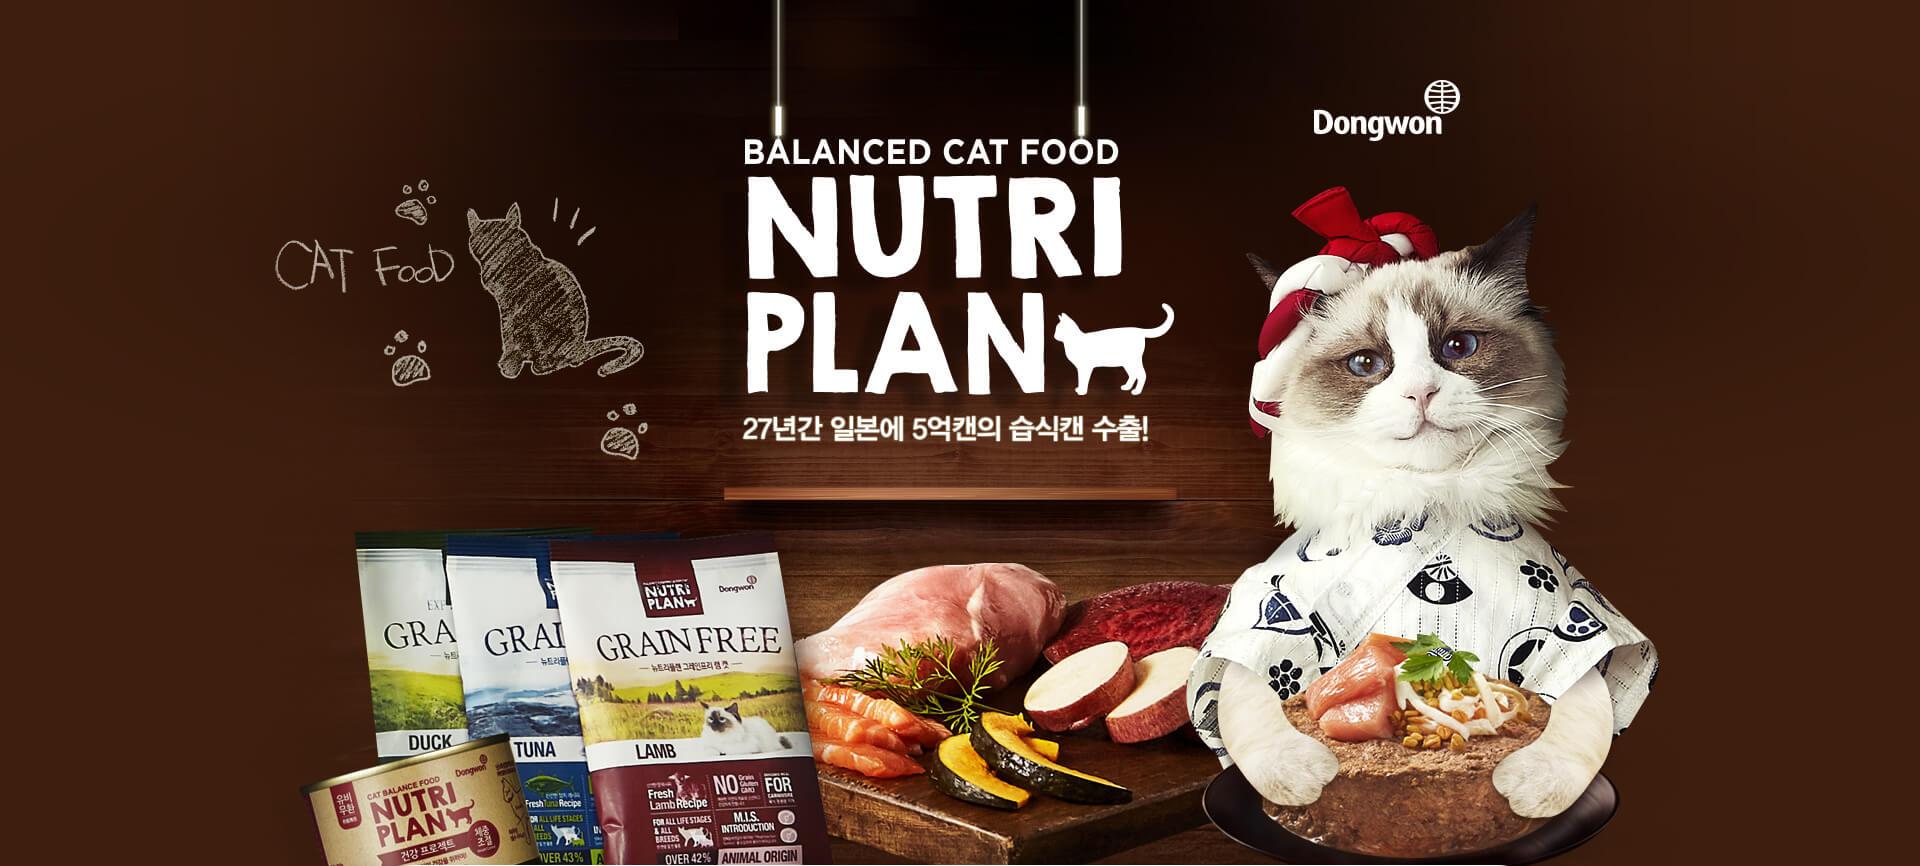 balanced formula for cat Nutri plan 뉴트리플랜 그레인프리 런칭 기념